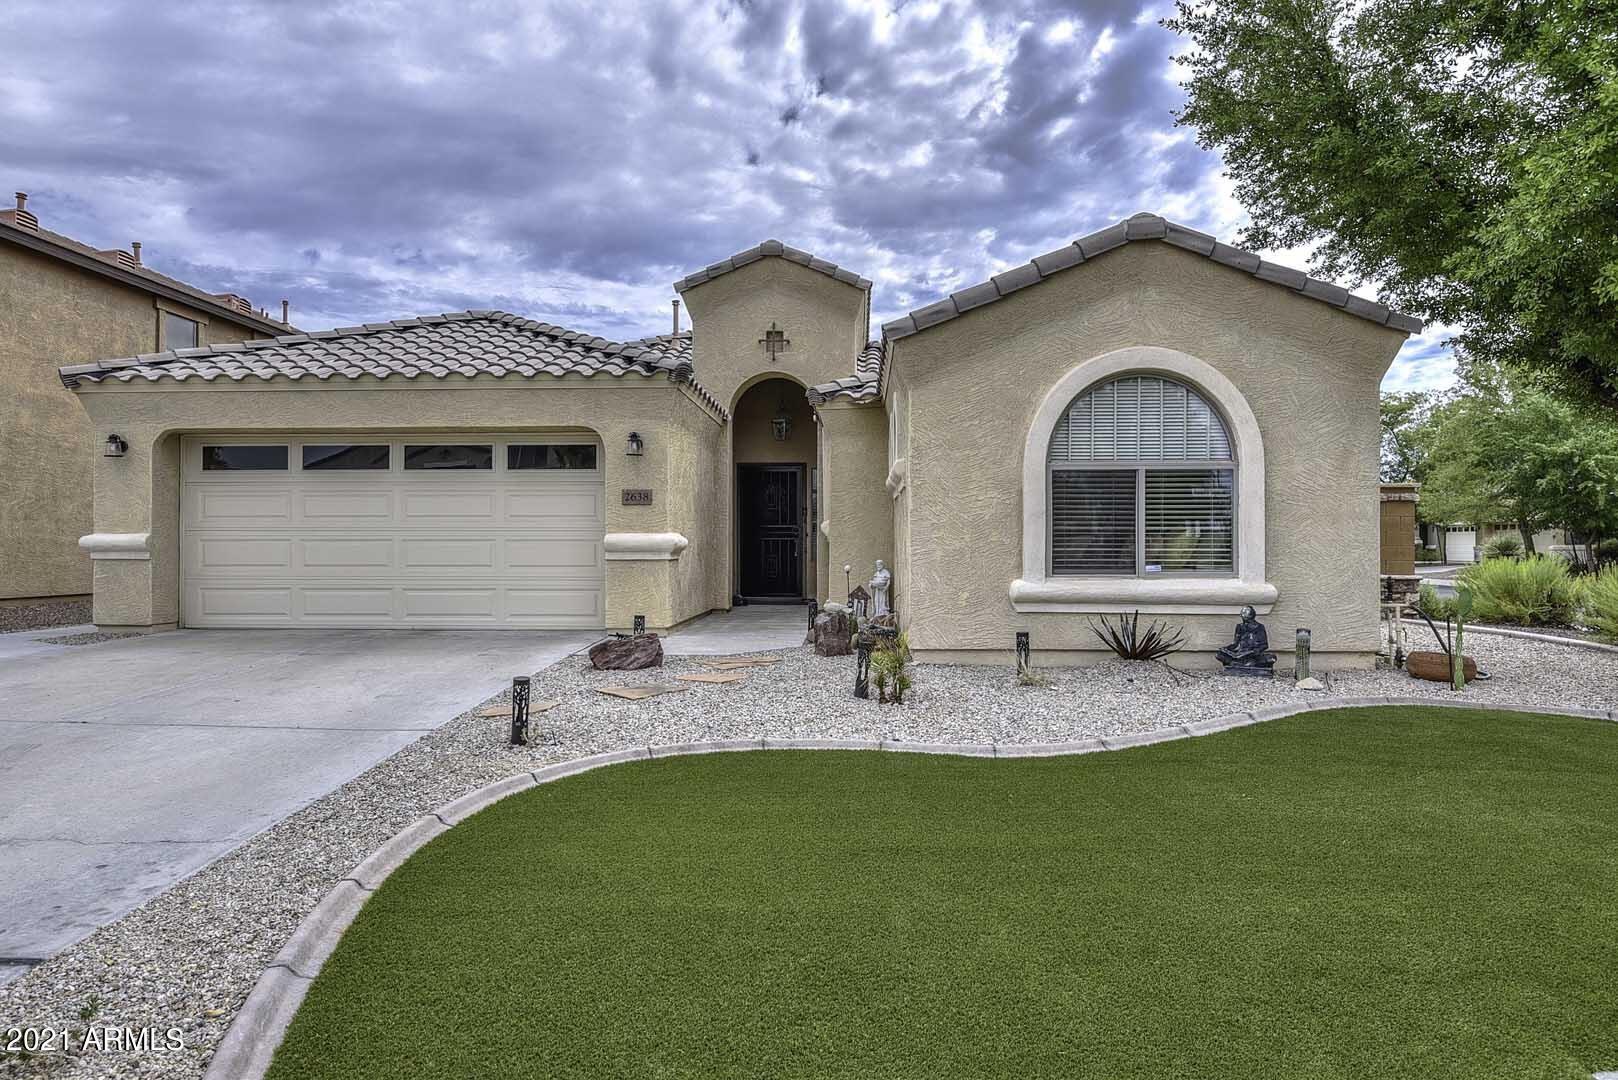 2638 E RIDGE CREEK Road, Phoenix, AZ 85024 - MLS#: 6267162